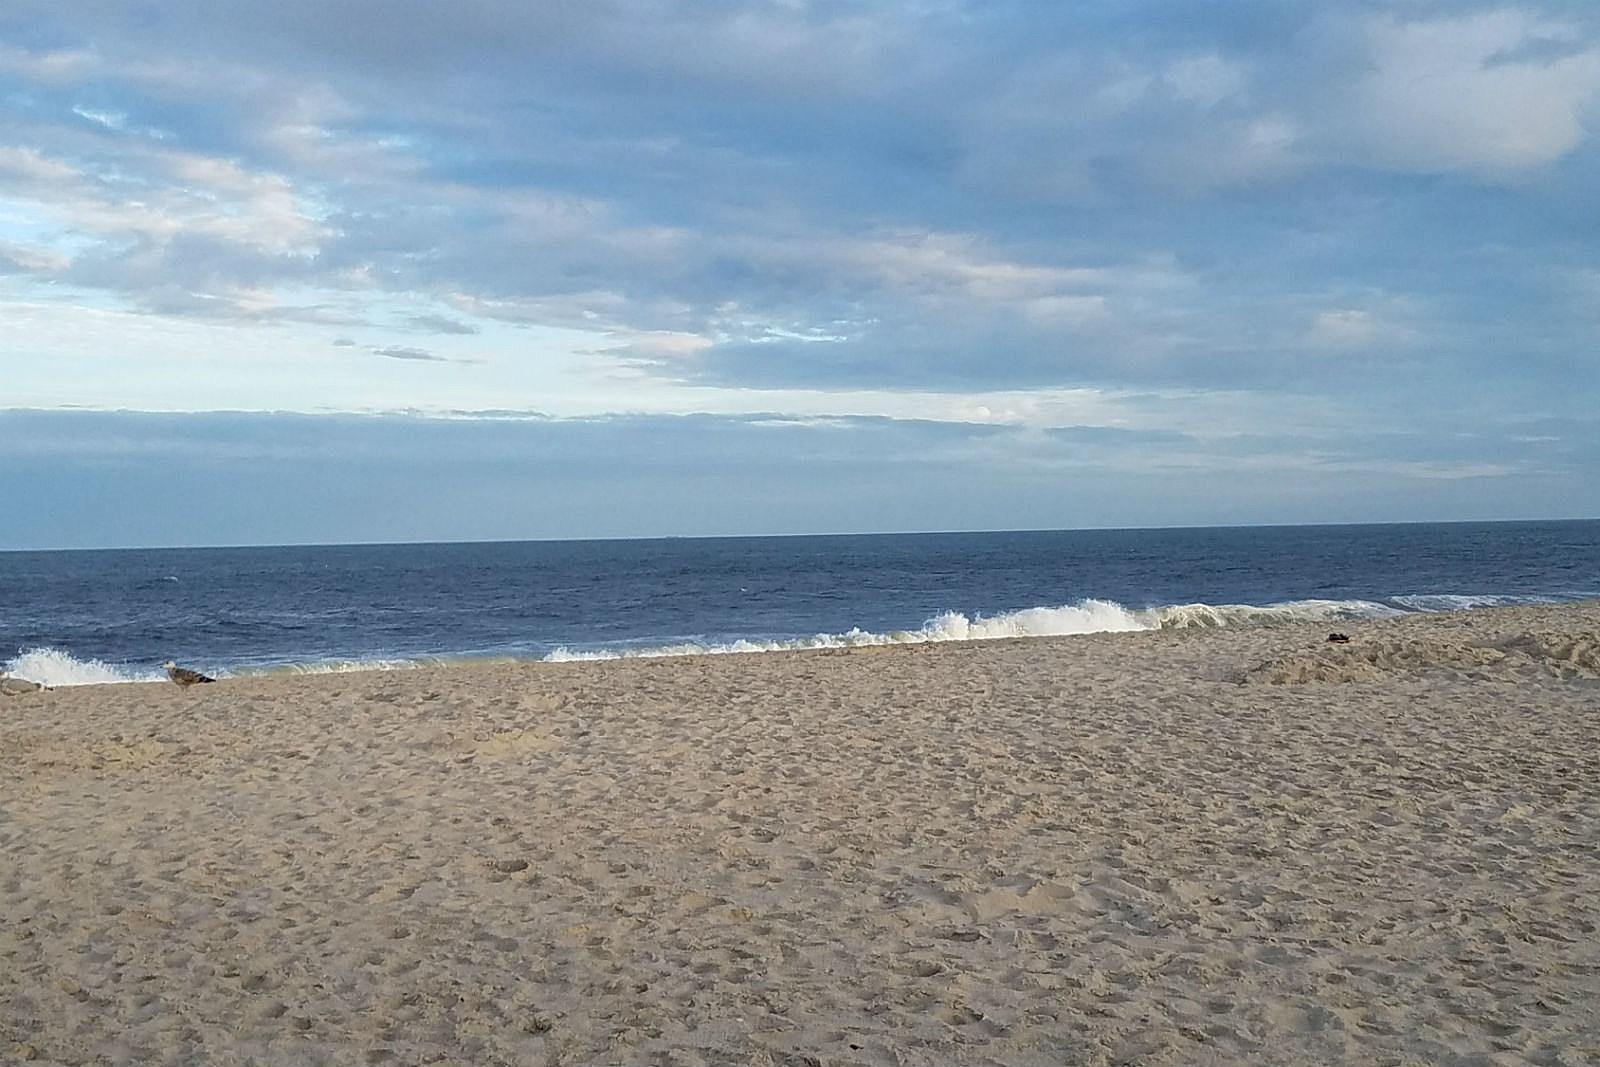 NJ weather: Warm, 80-degree October 'beach weather' ahead this week?!